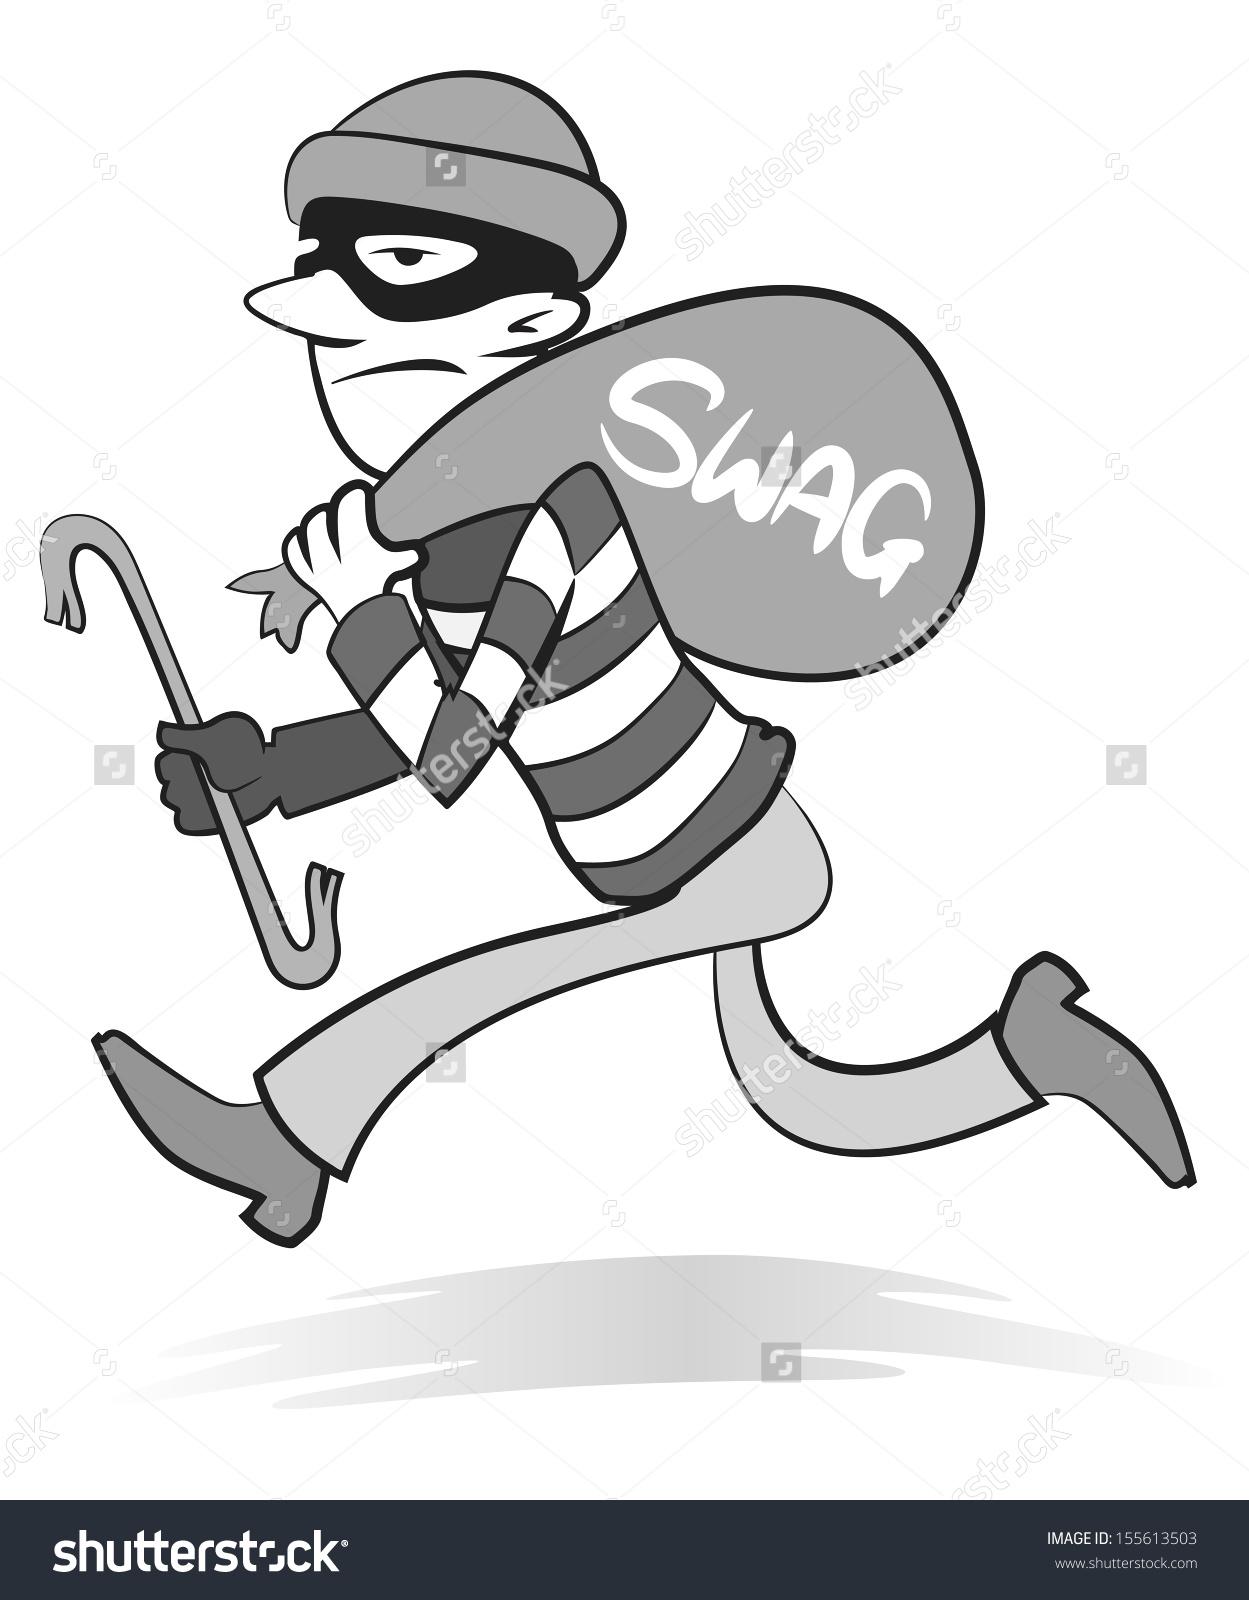 Burglar clipart bag. Swag